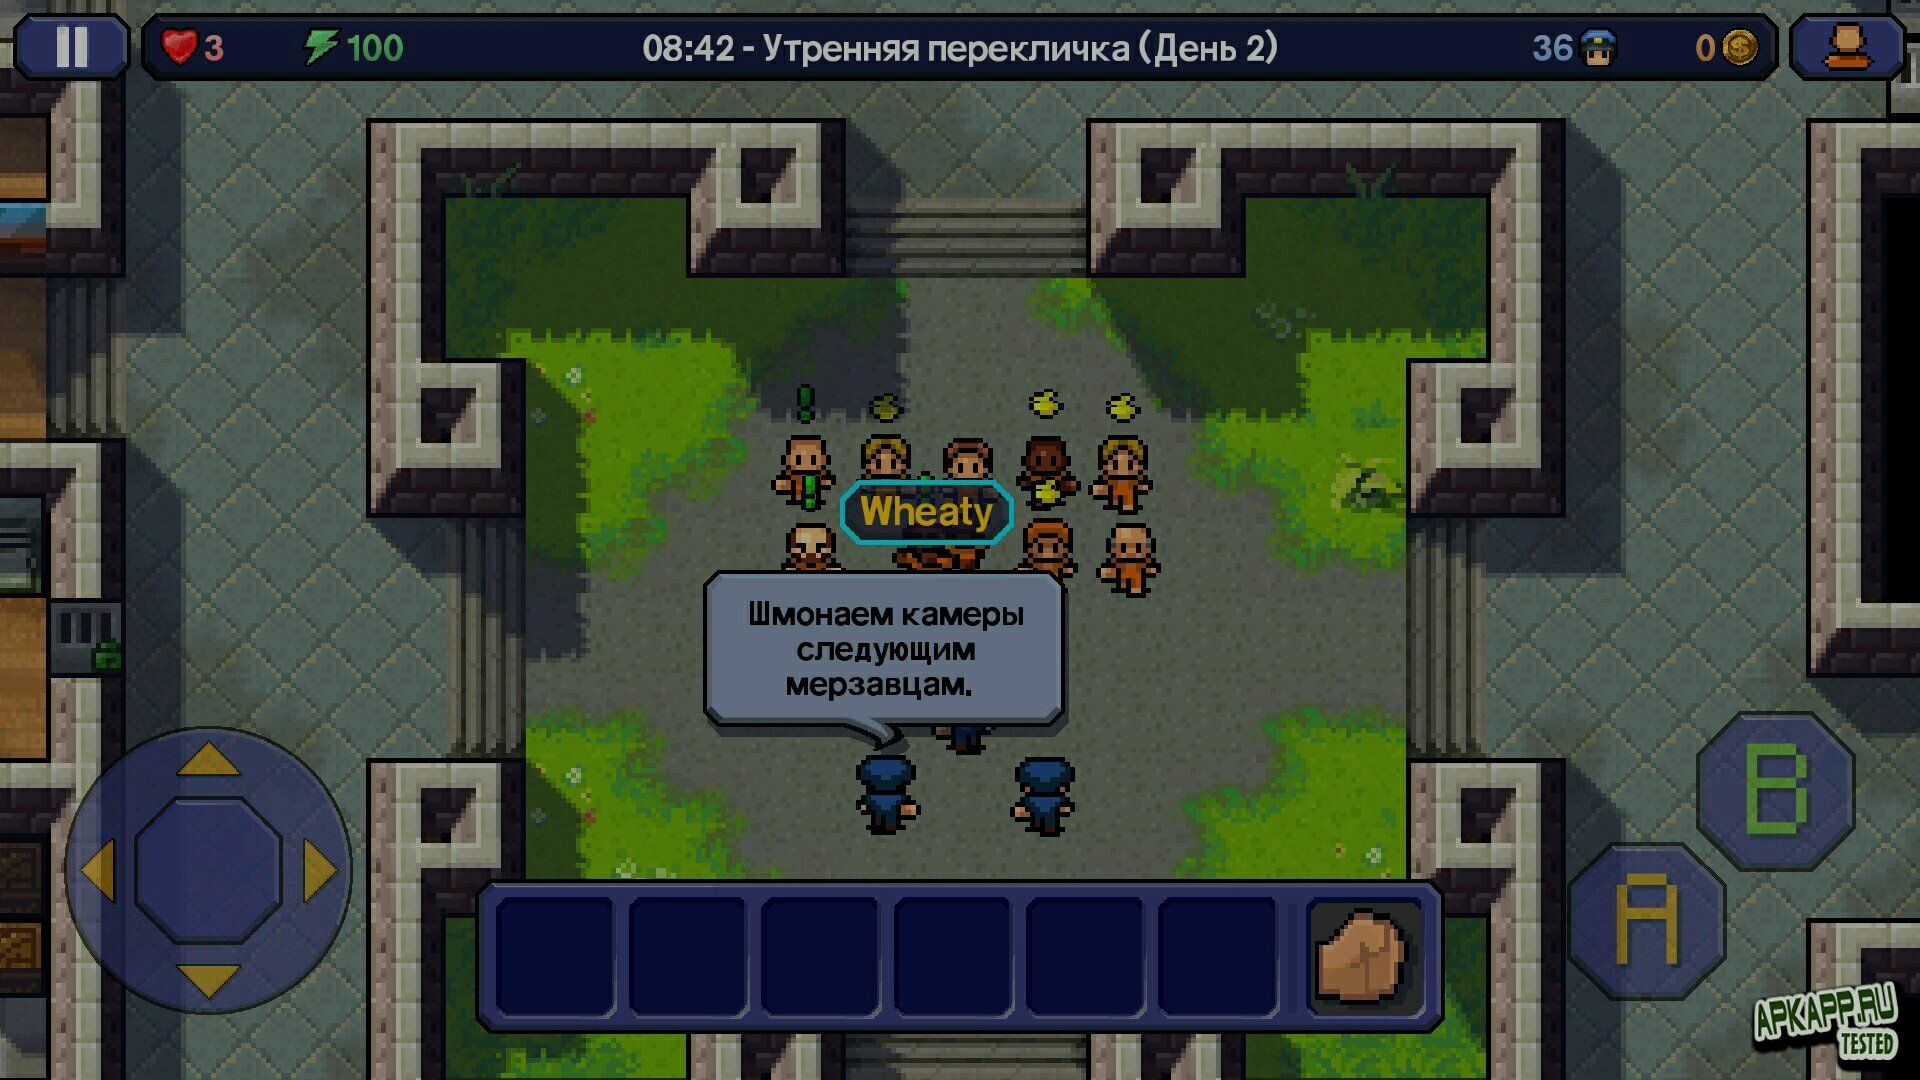 Check dive pc full rus скачать бесплатно